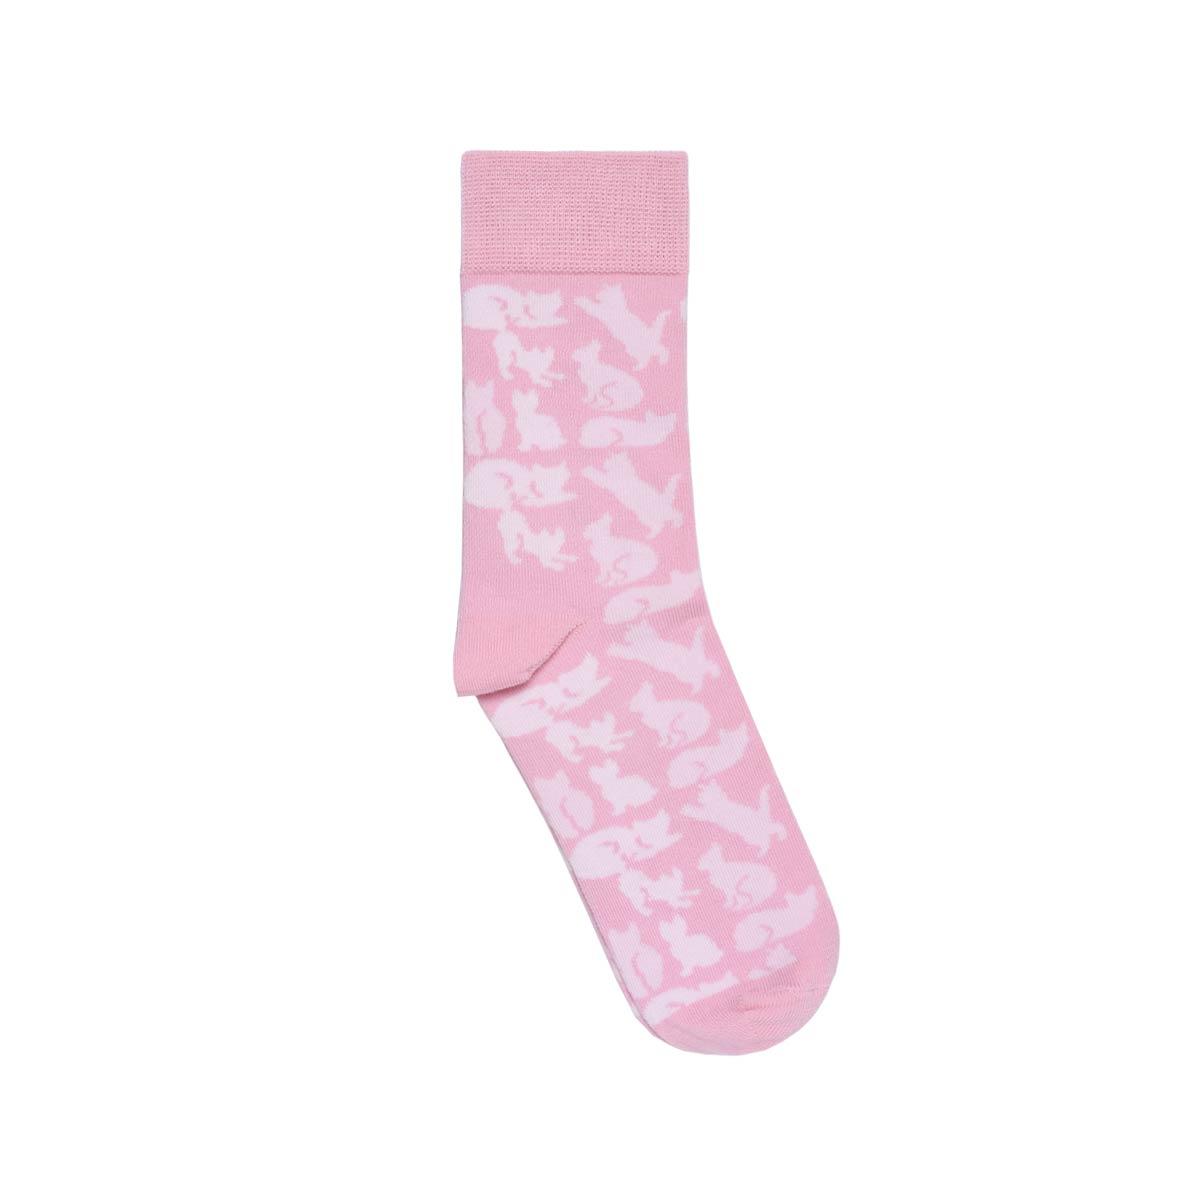 CH-00735-A12-chaussettes fantaisie-femme-chats-rose-35-39